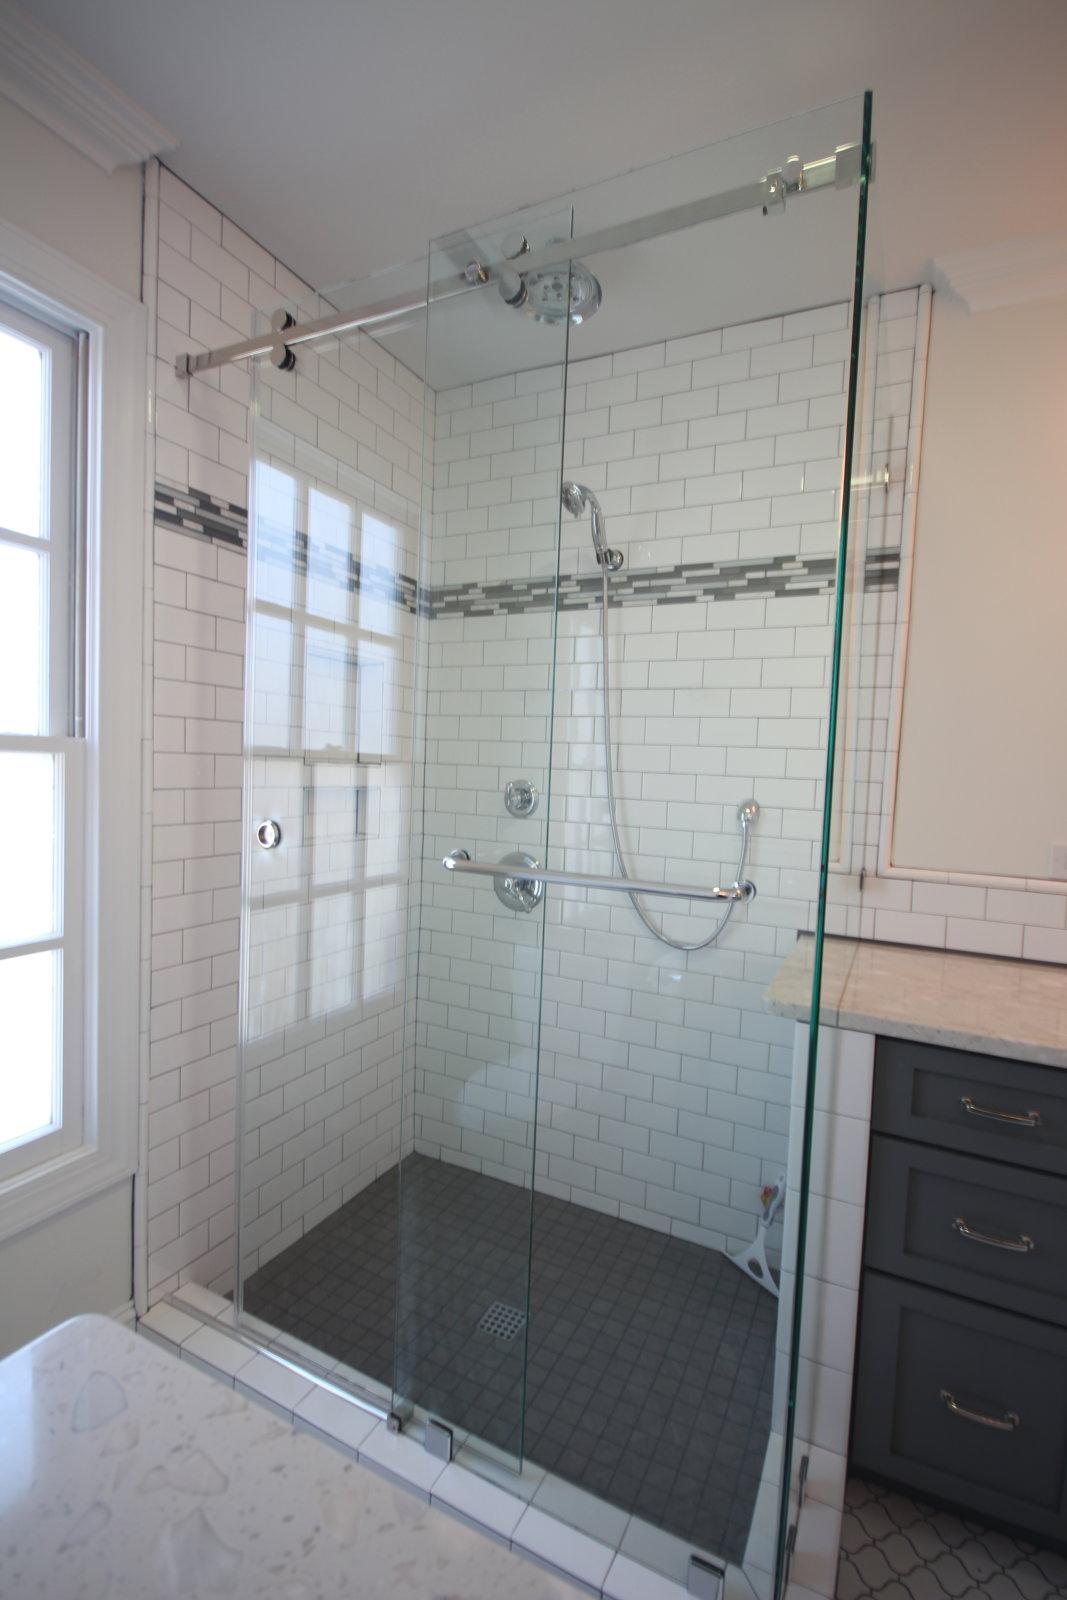 90 Degree Serenity Sliding Shower Enclosure Mia Shower Doors